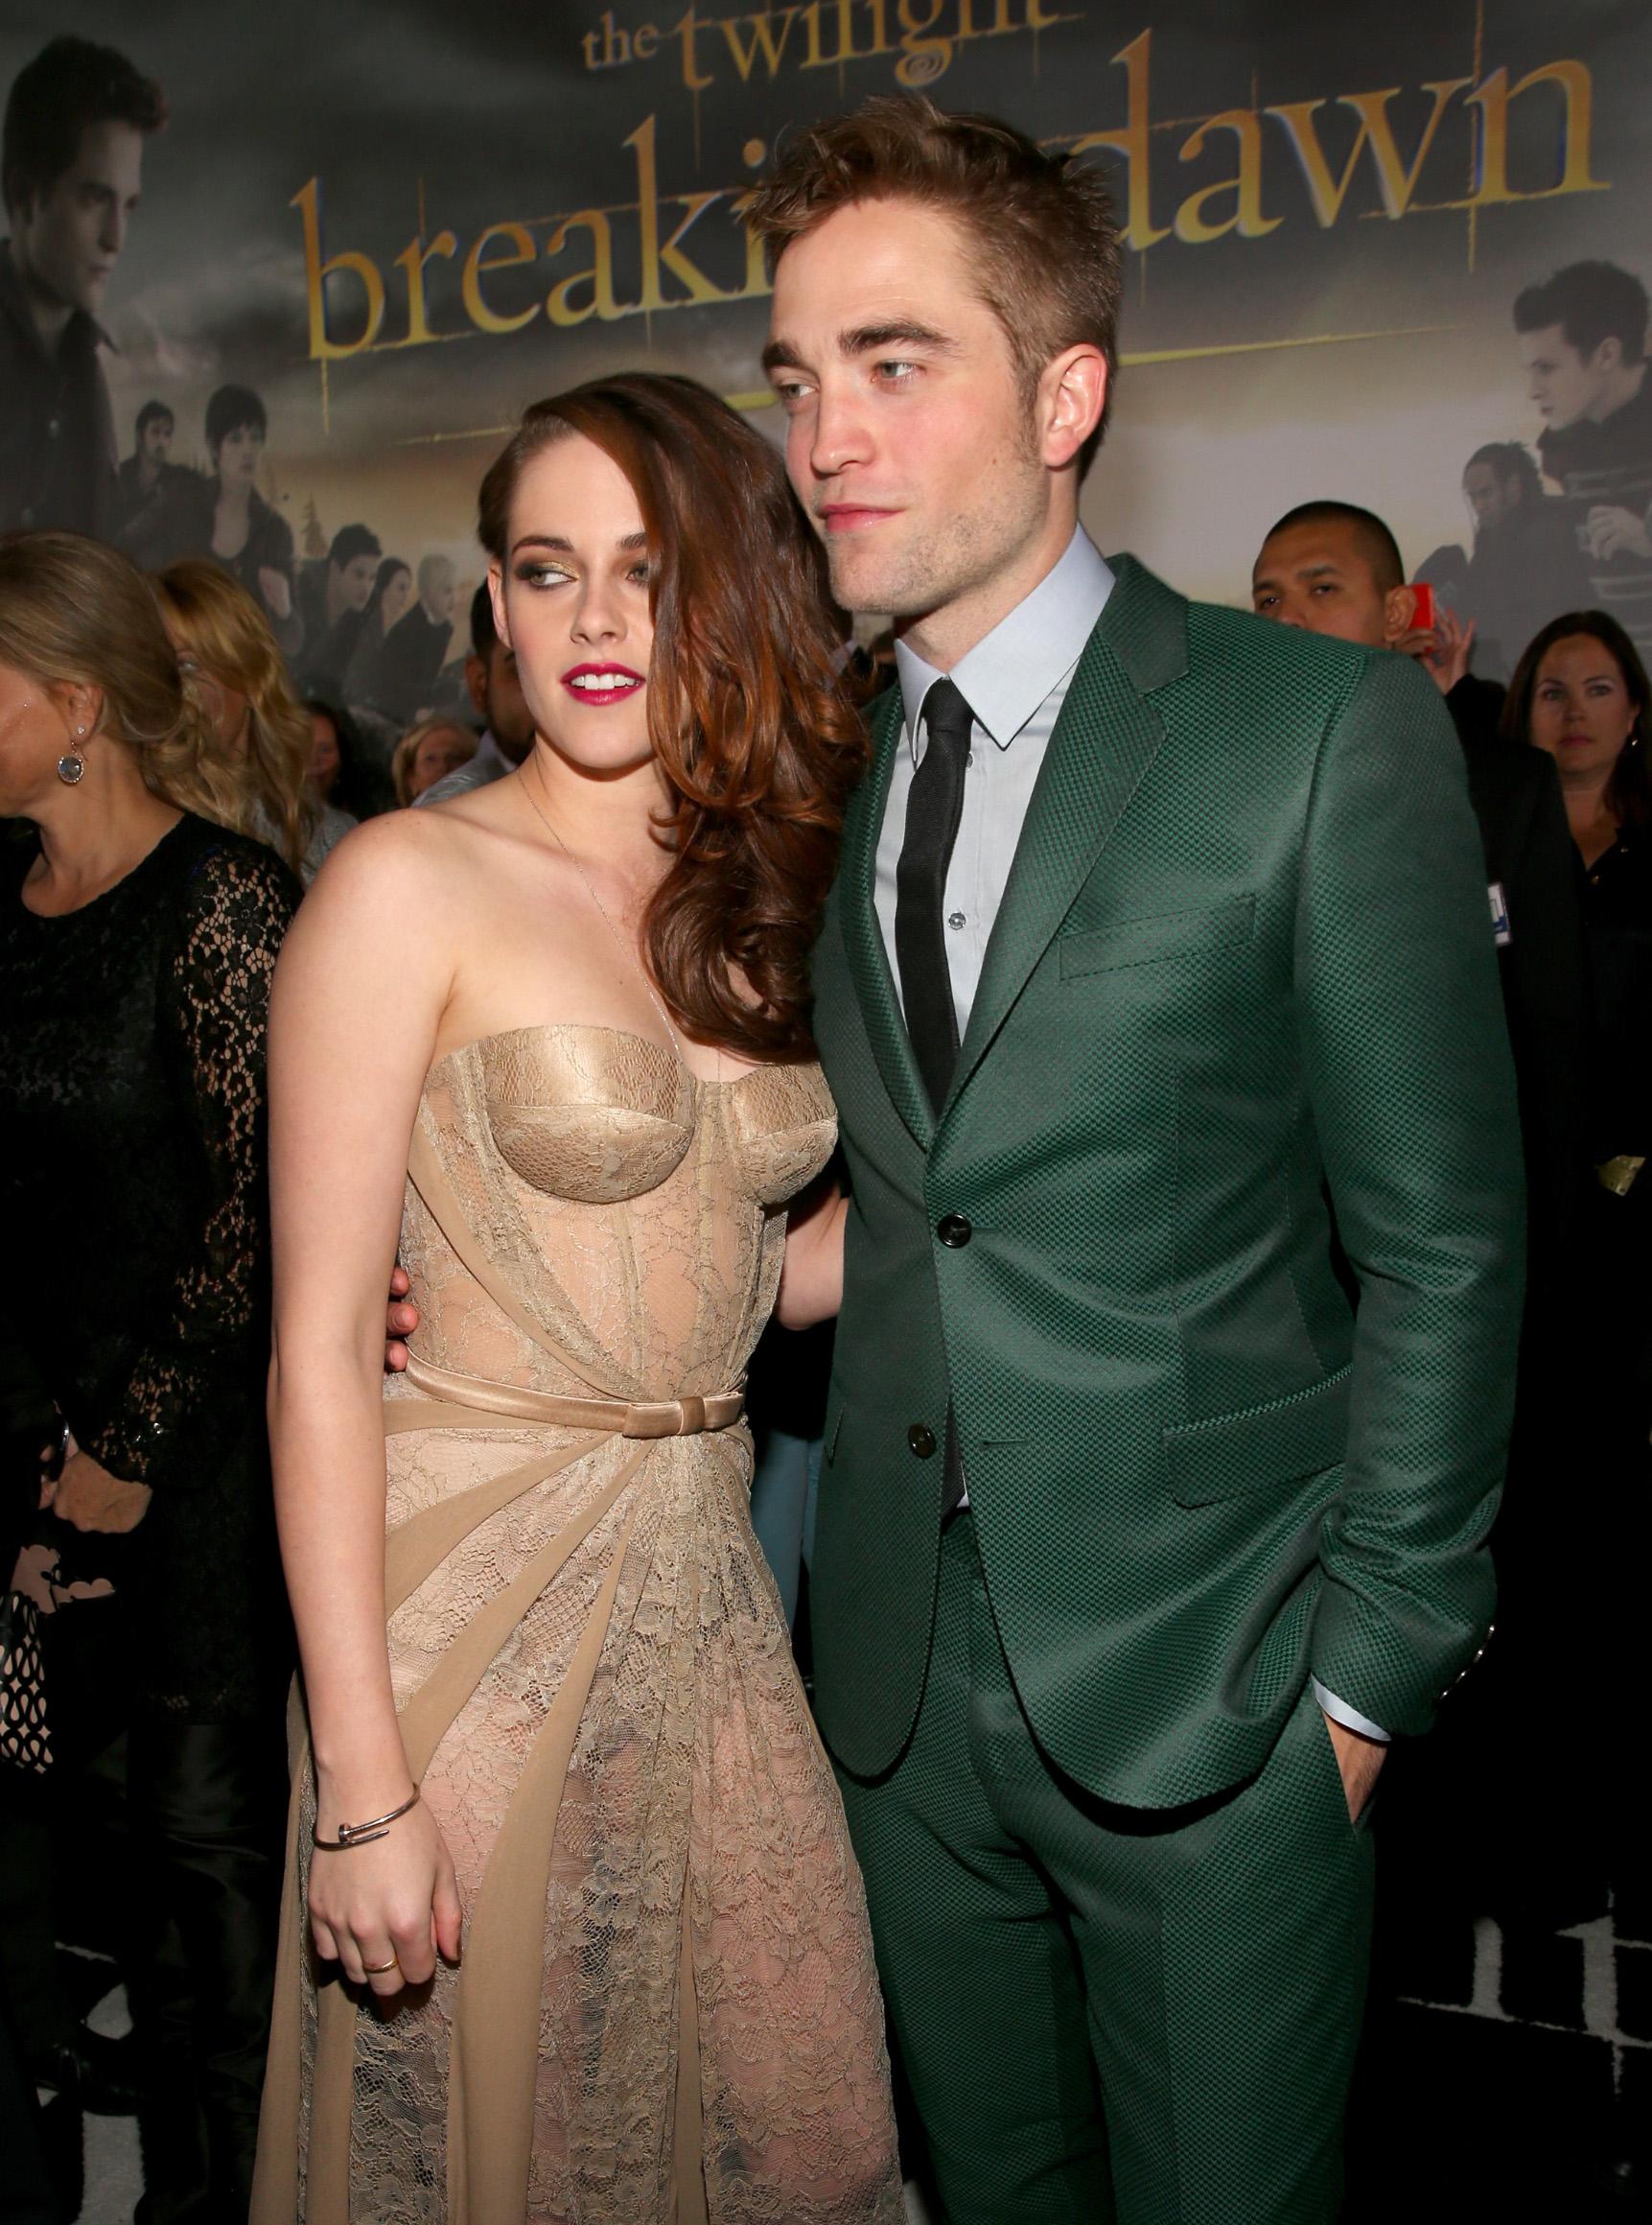 LOS ANGELES, CA - NOVEMBER 12:  Actors Kristen Stewart (L) and Robert Pattinson arrive at the premiere of Summit Entertainment's